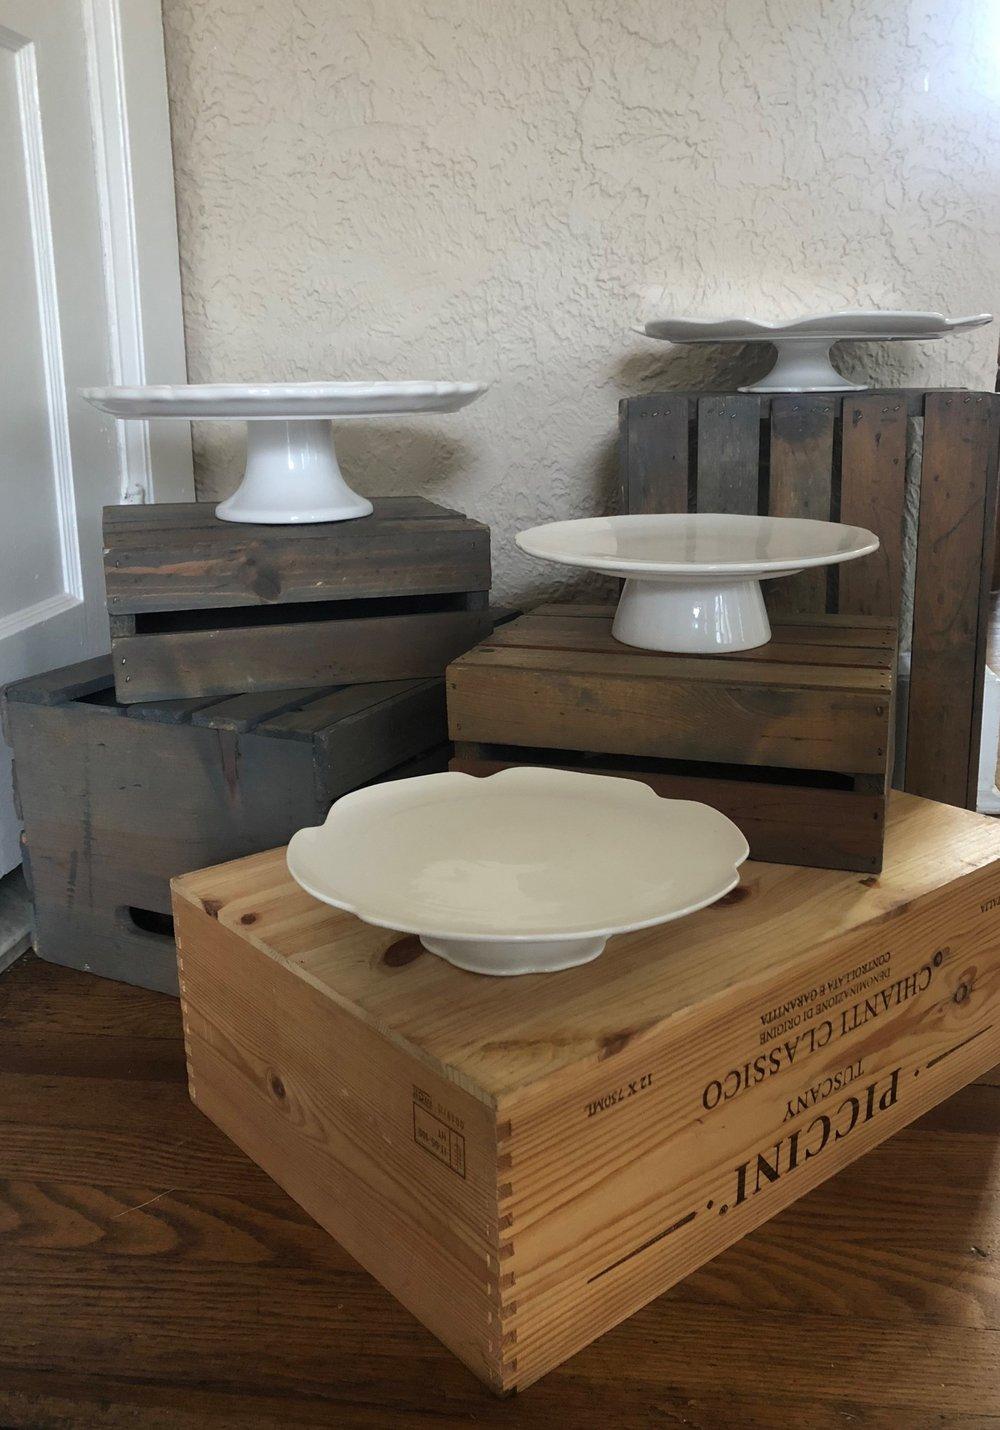 White Ceramic Cake Plates - (Quantity: 4)- 2 Small: 8 in. across- 1 Medium: 9.5 in. across- 1 Large: 11.5 in. across